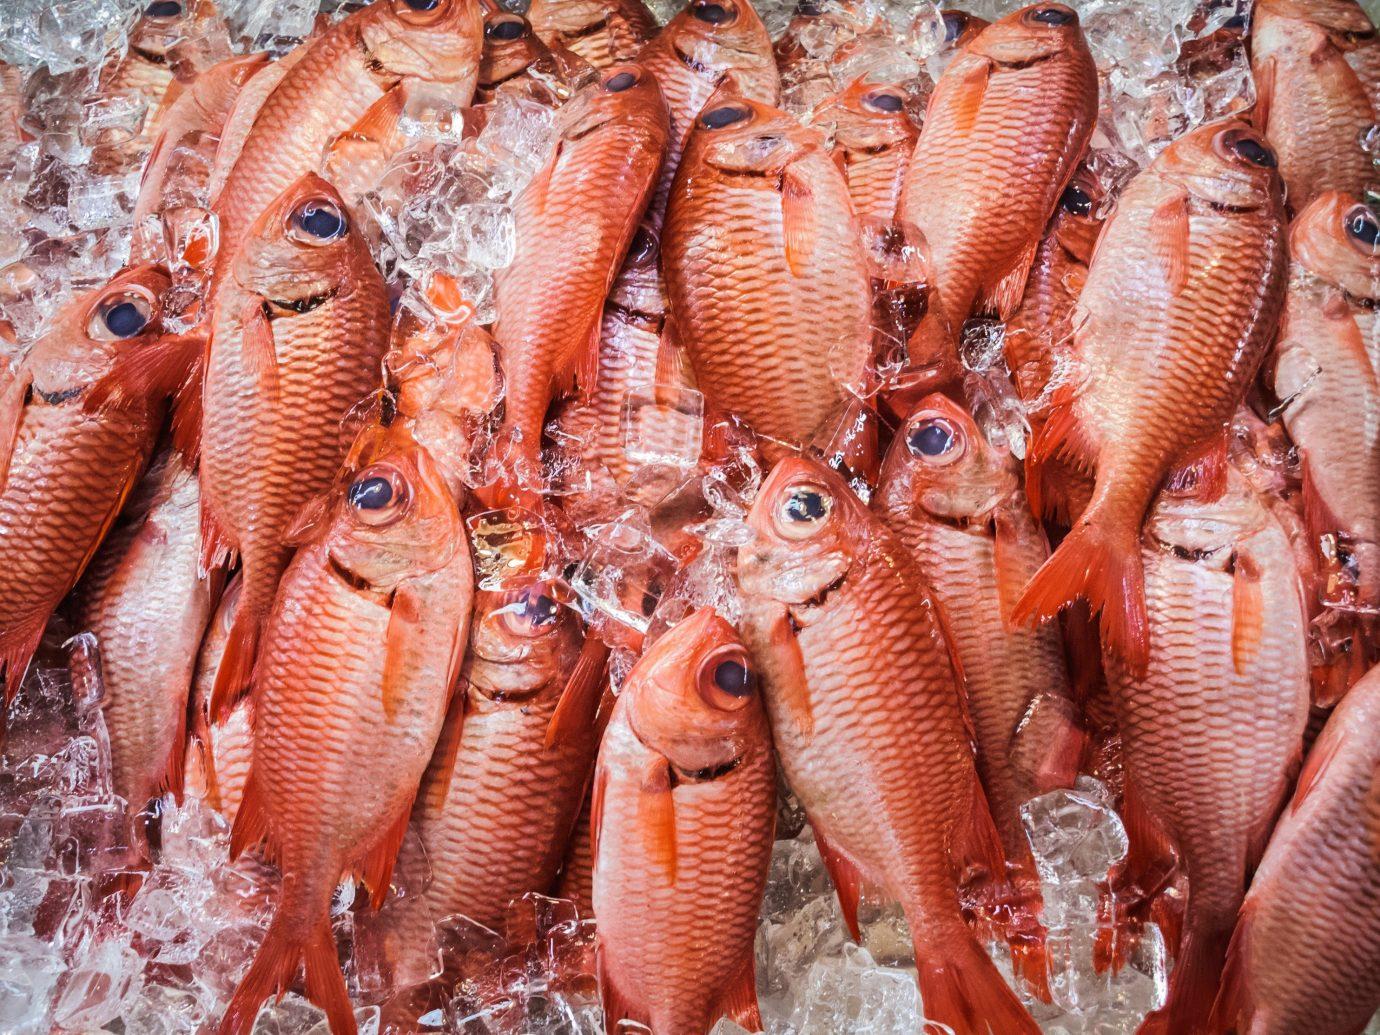 Food + Drink animal marine biology food Seafood invertebrate red snapper animal source foods snapper fish